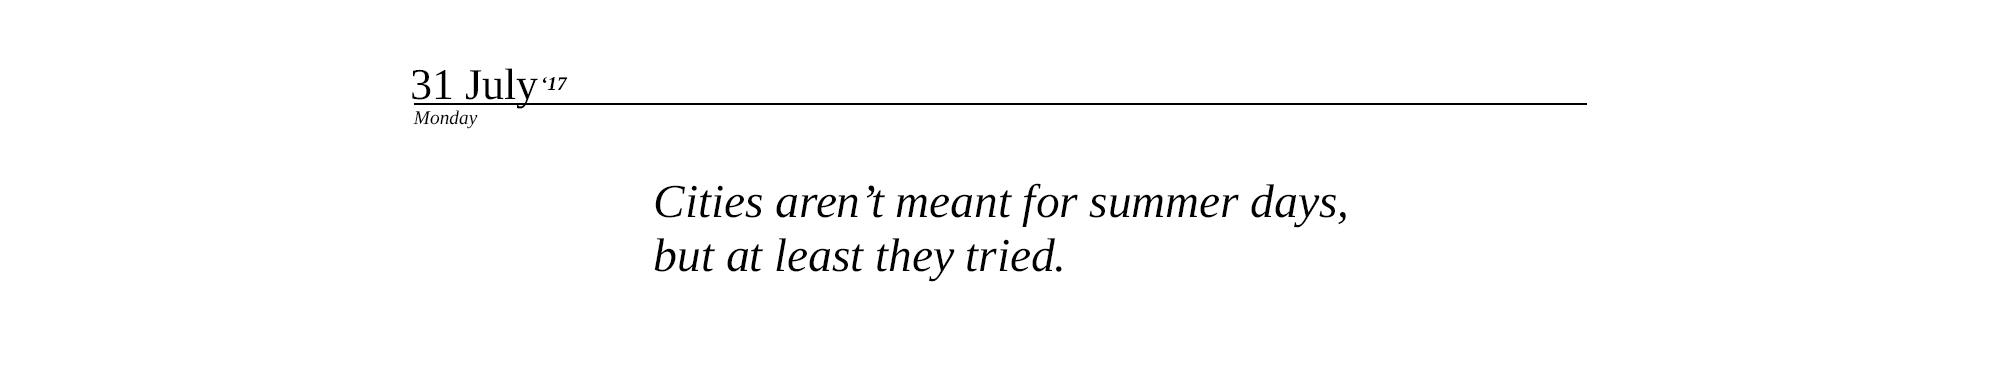 Dreamlike Nostalgia of Summer by Hunky-Dunky